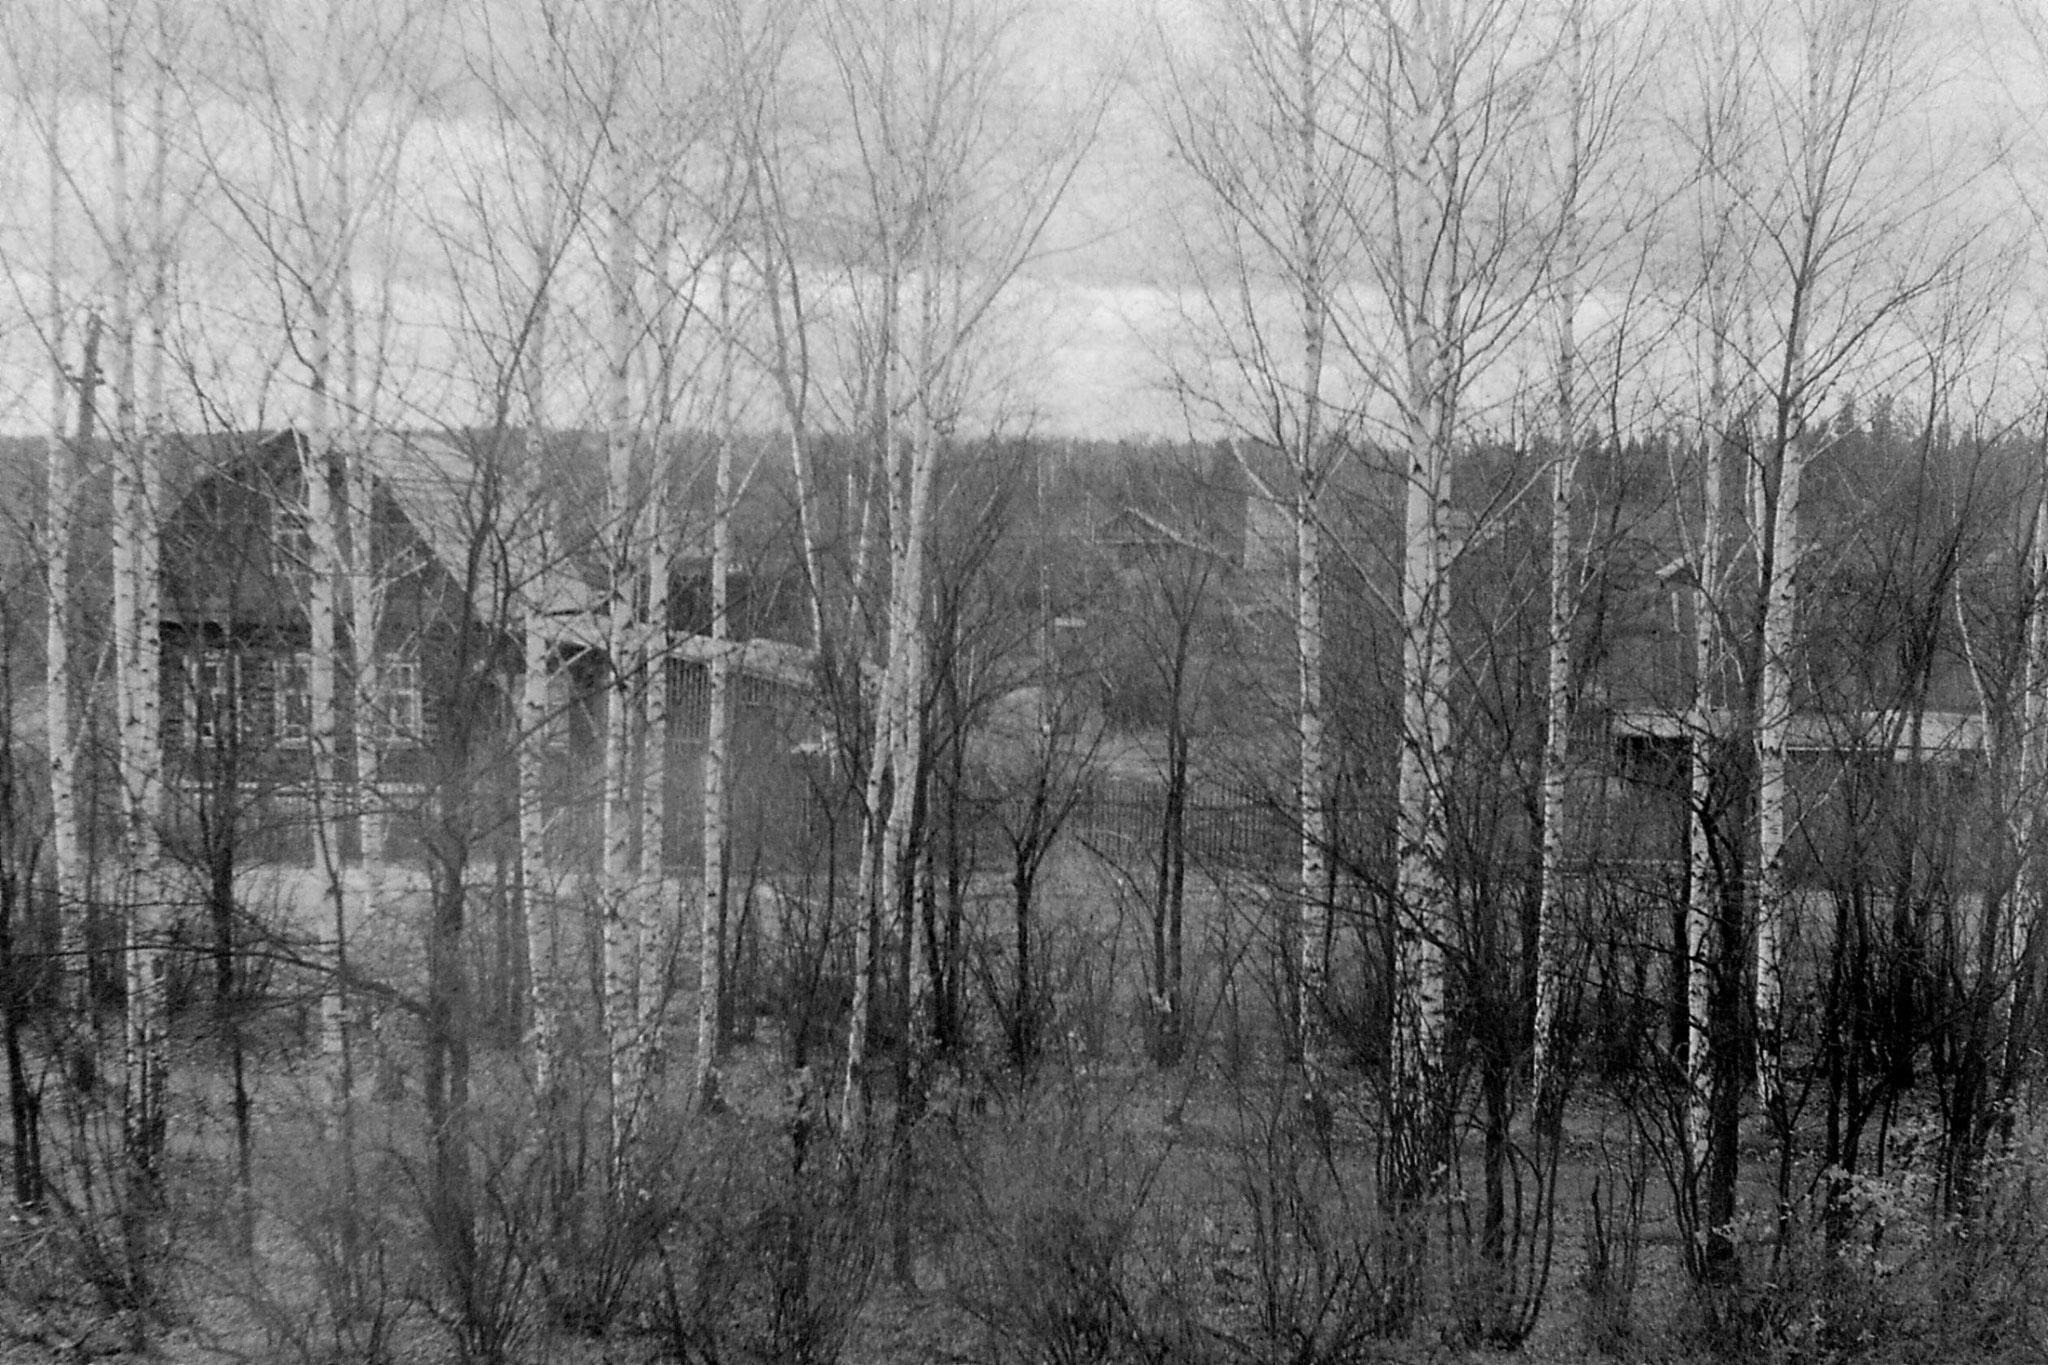 19/10/1988: 28: from Siberian Express between Balezino and Perm